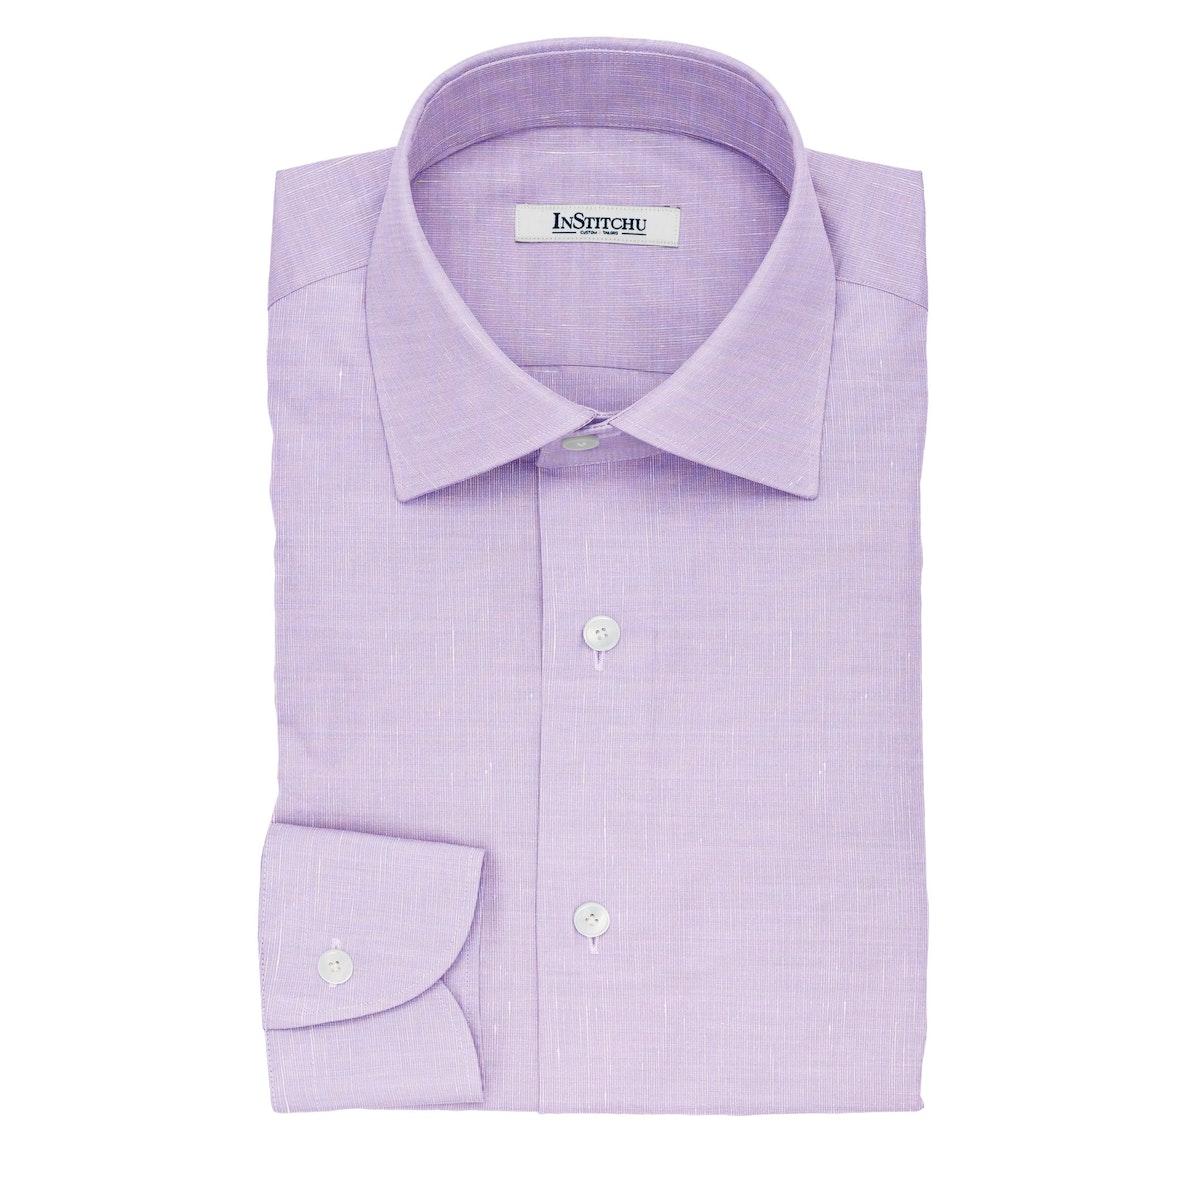 InStitchu Collection The Hugo Violet Cotton Linen Blend Shirt